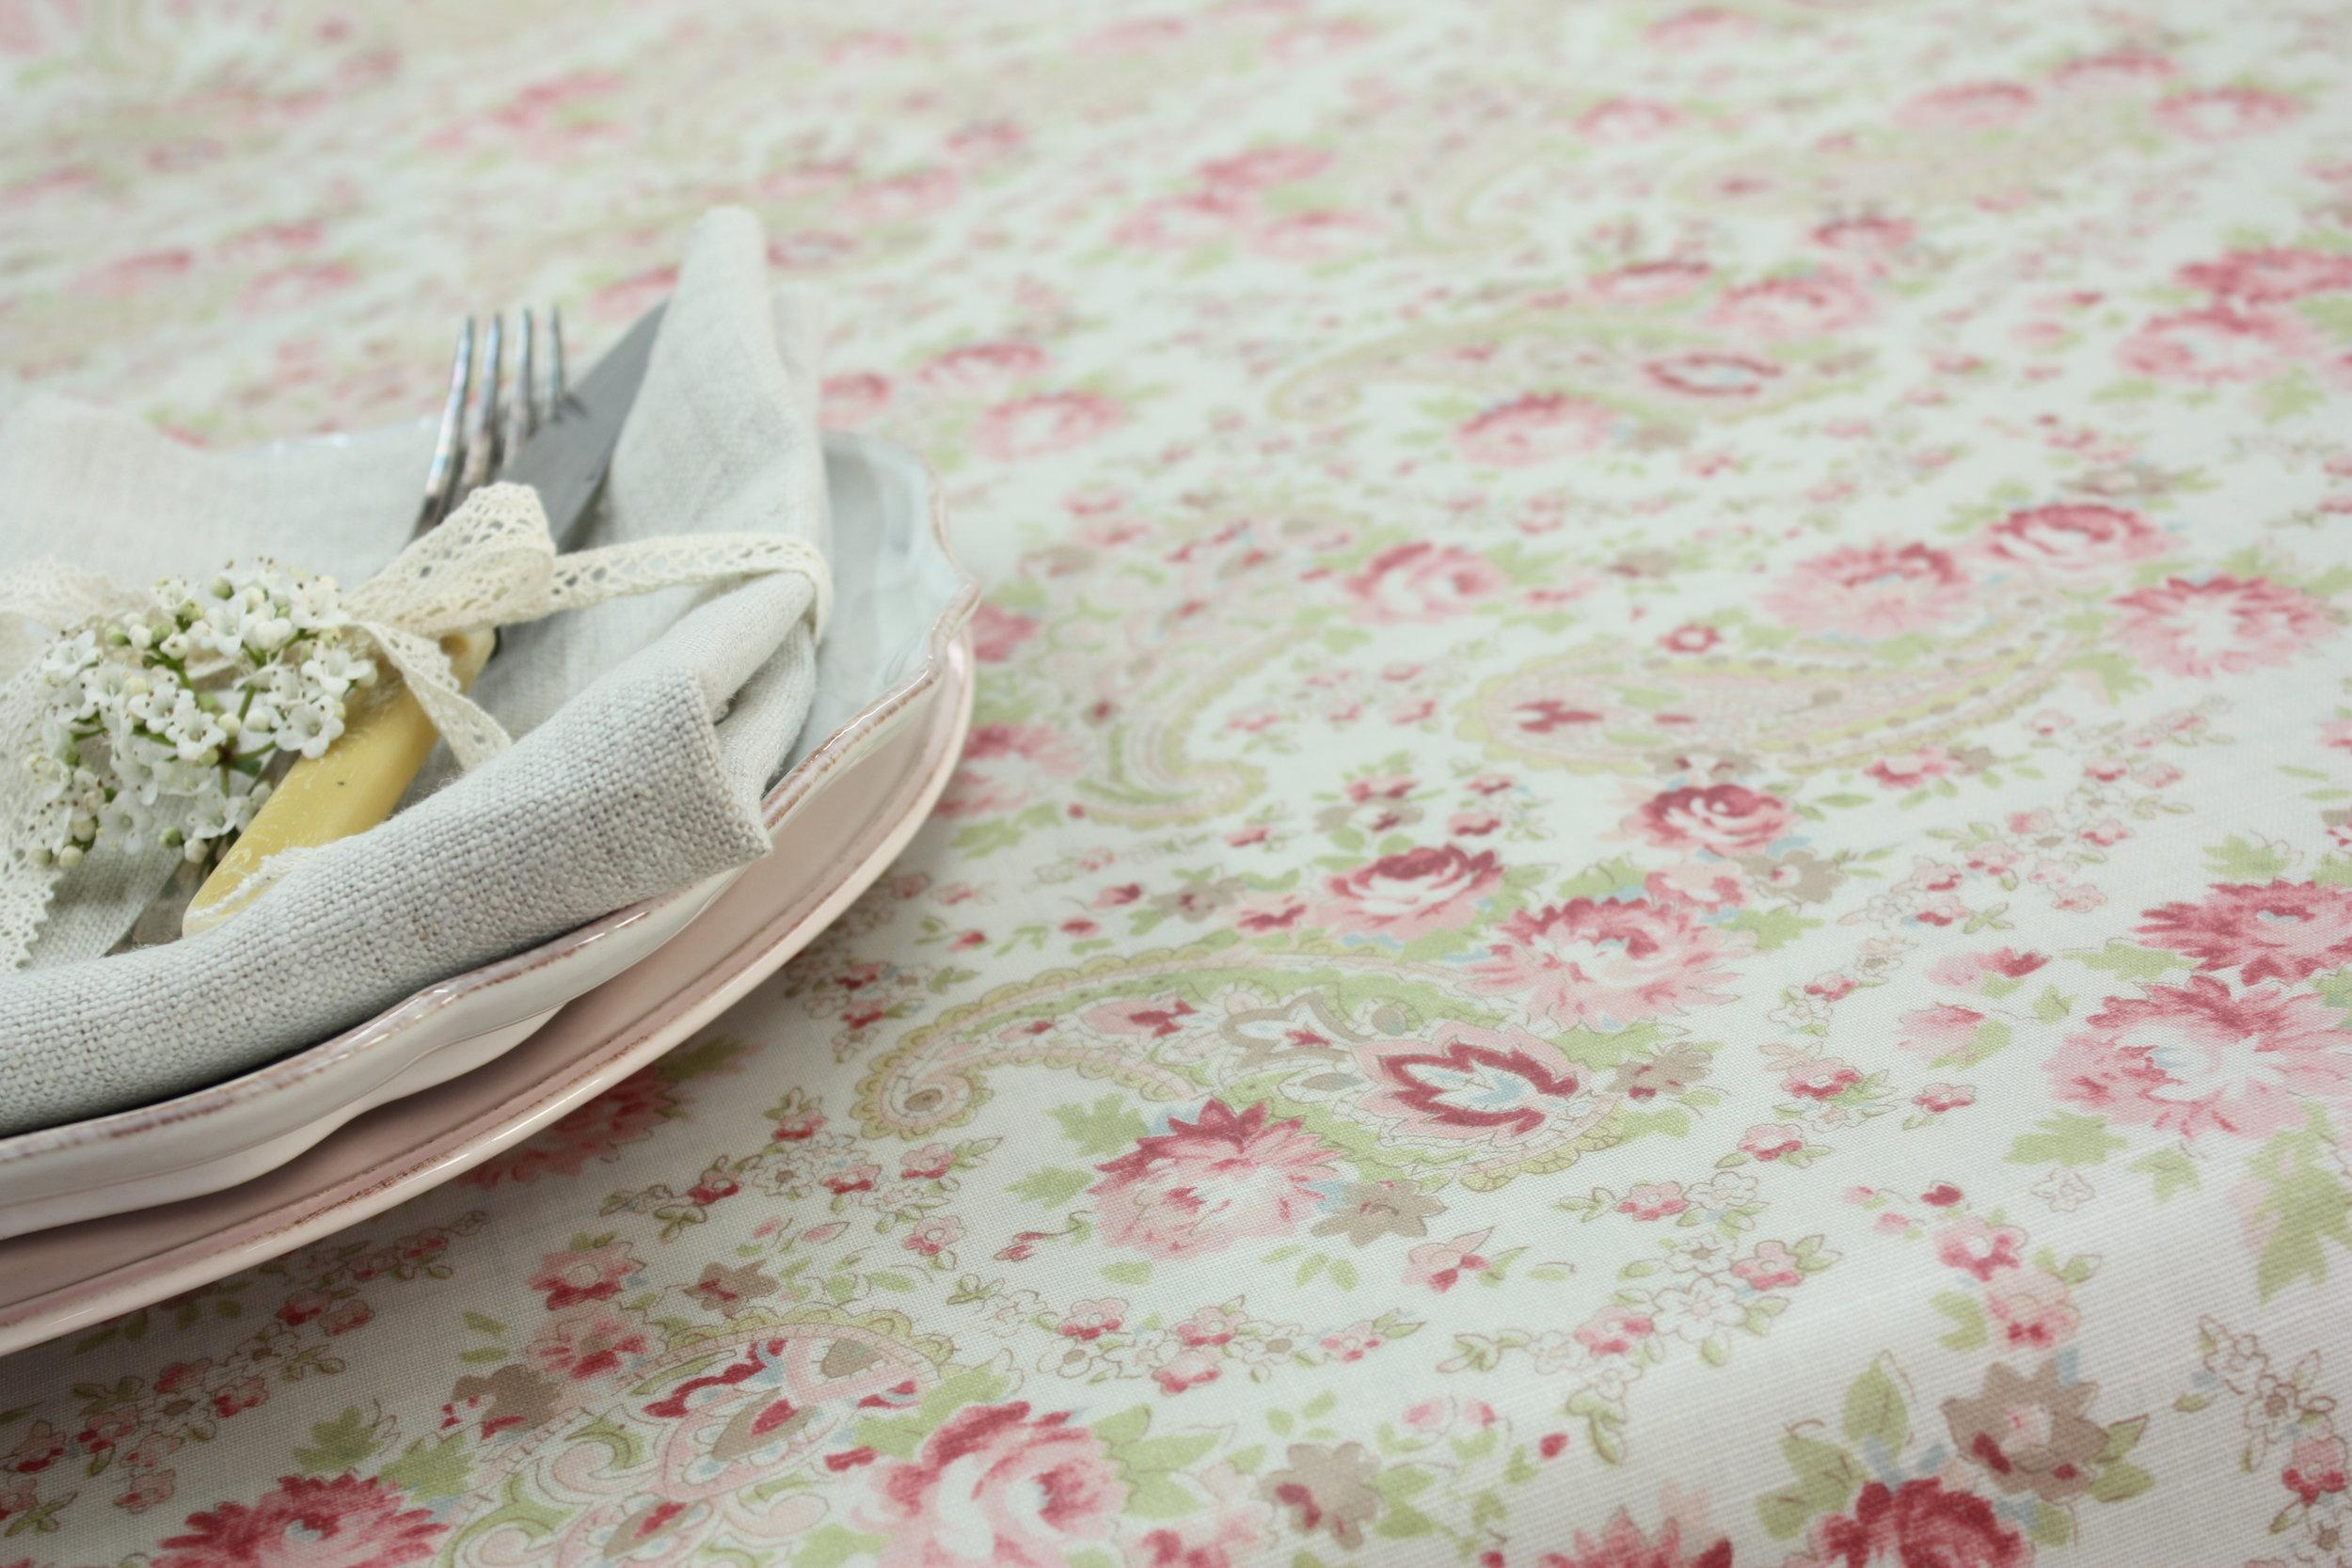 Sarah Hardaker Vintage Paisley Oil Cloth Rhubarb.JPG